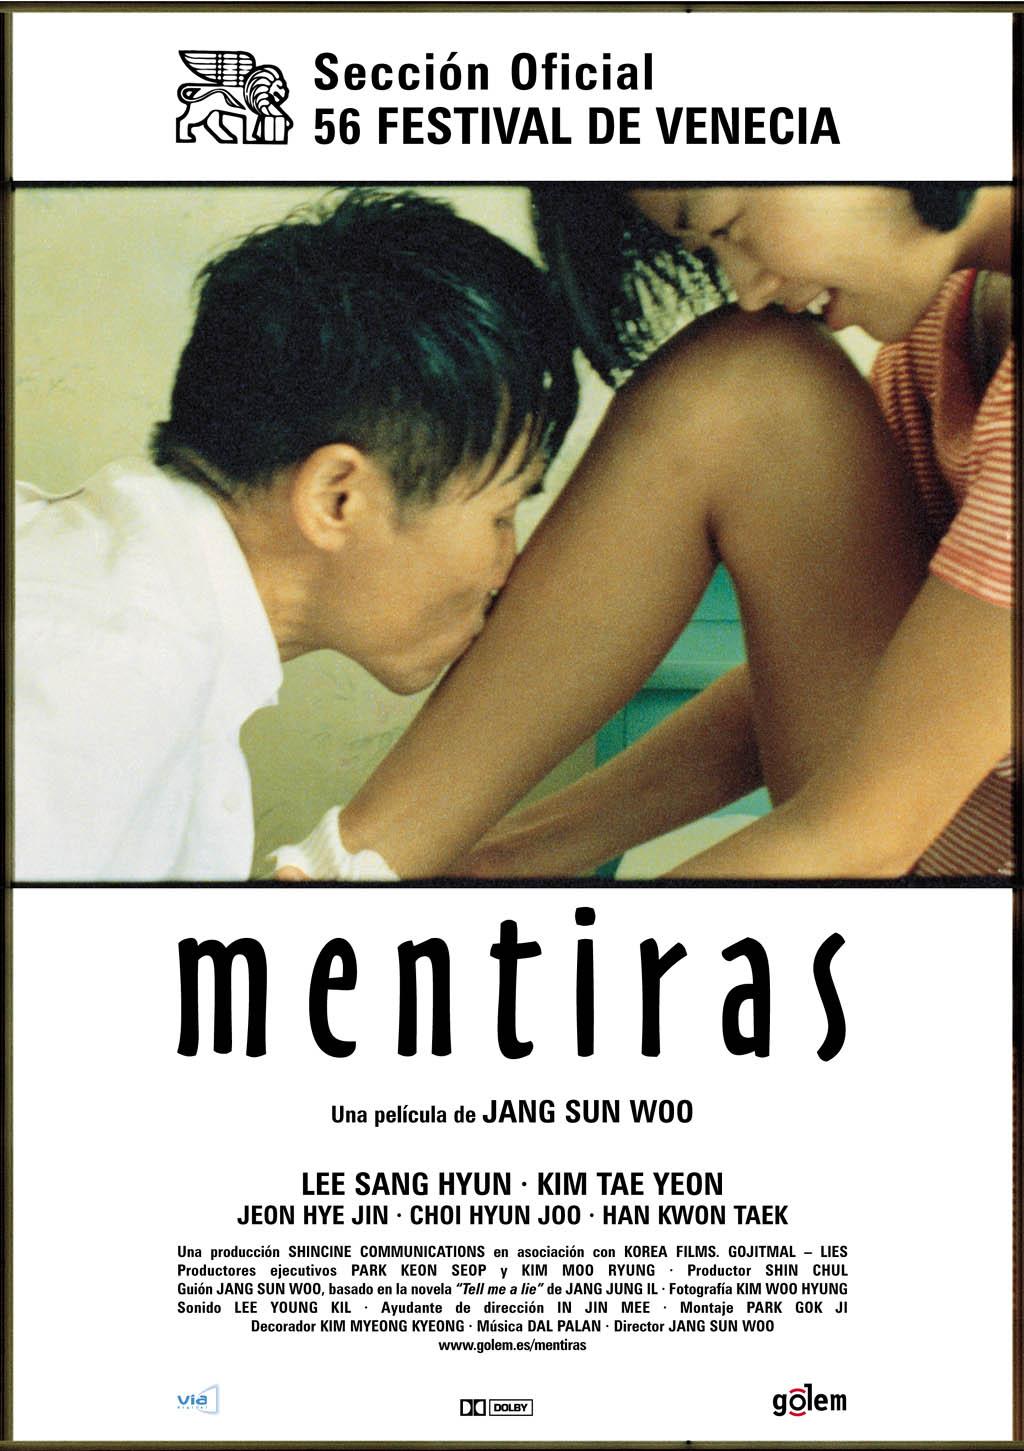 Mentiras+(1999).jpg